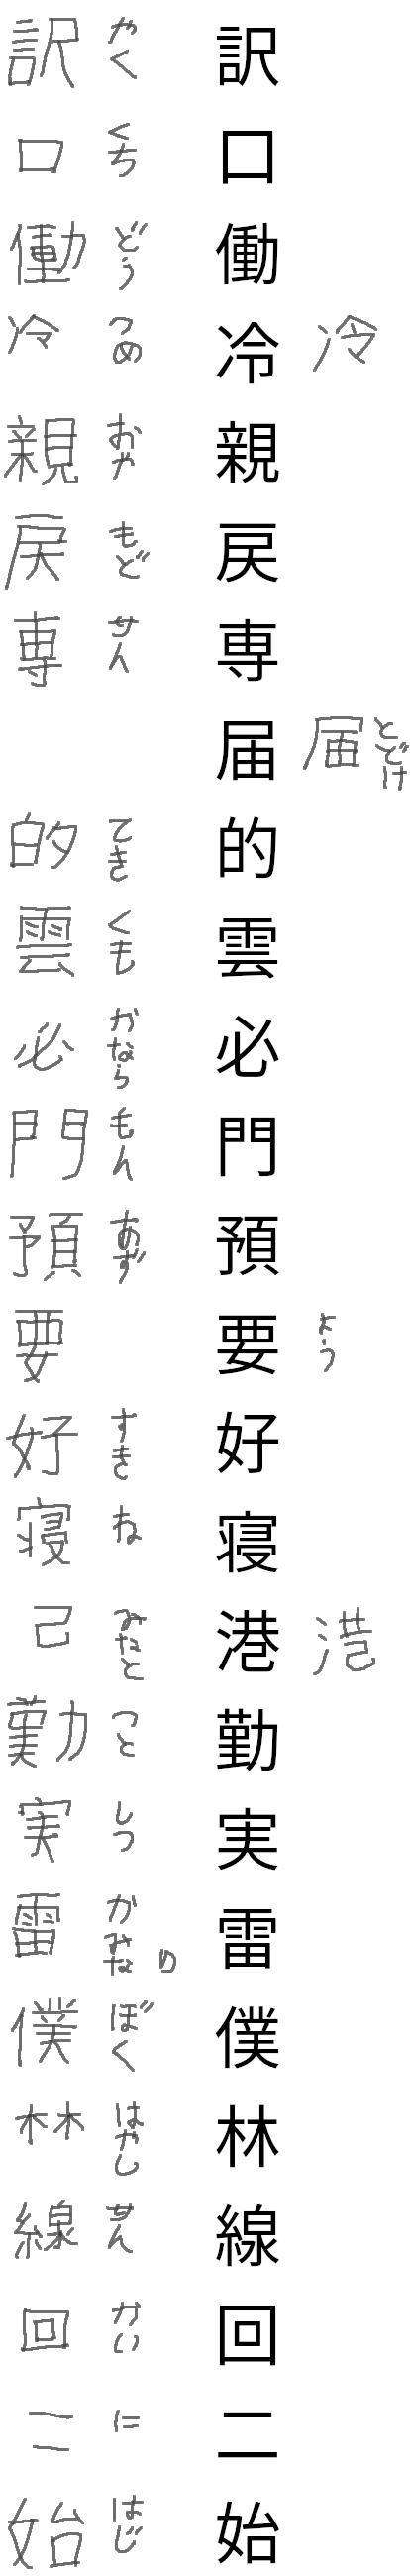 kanji test row 26